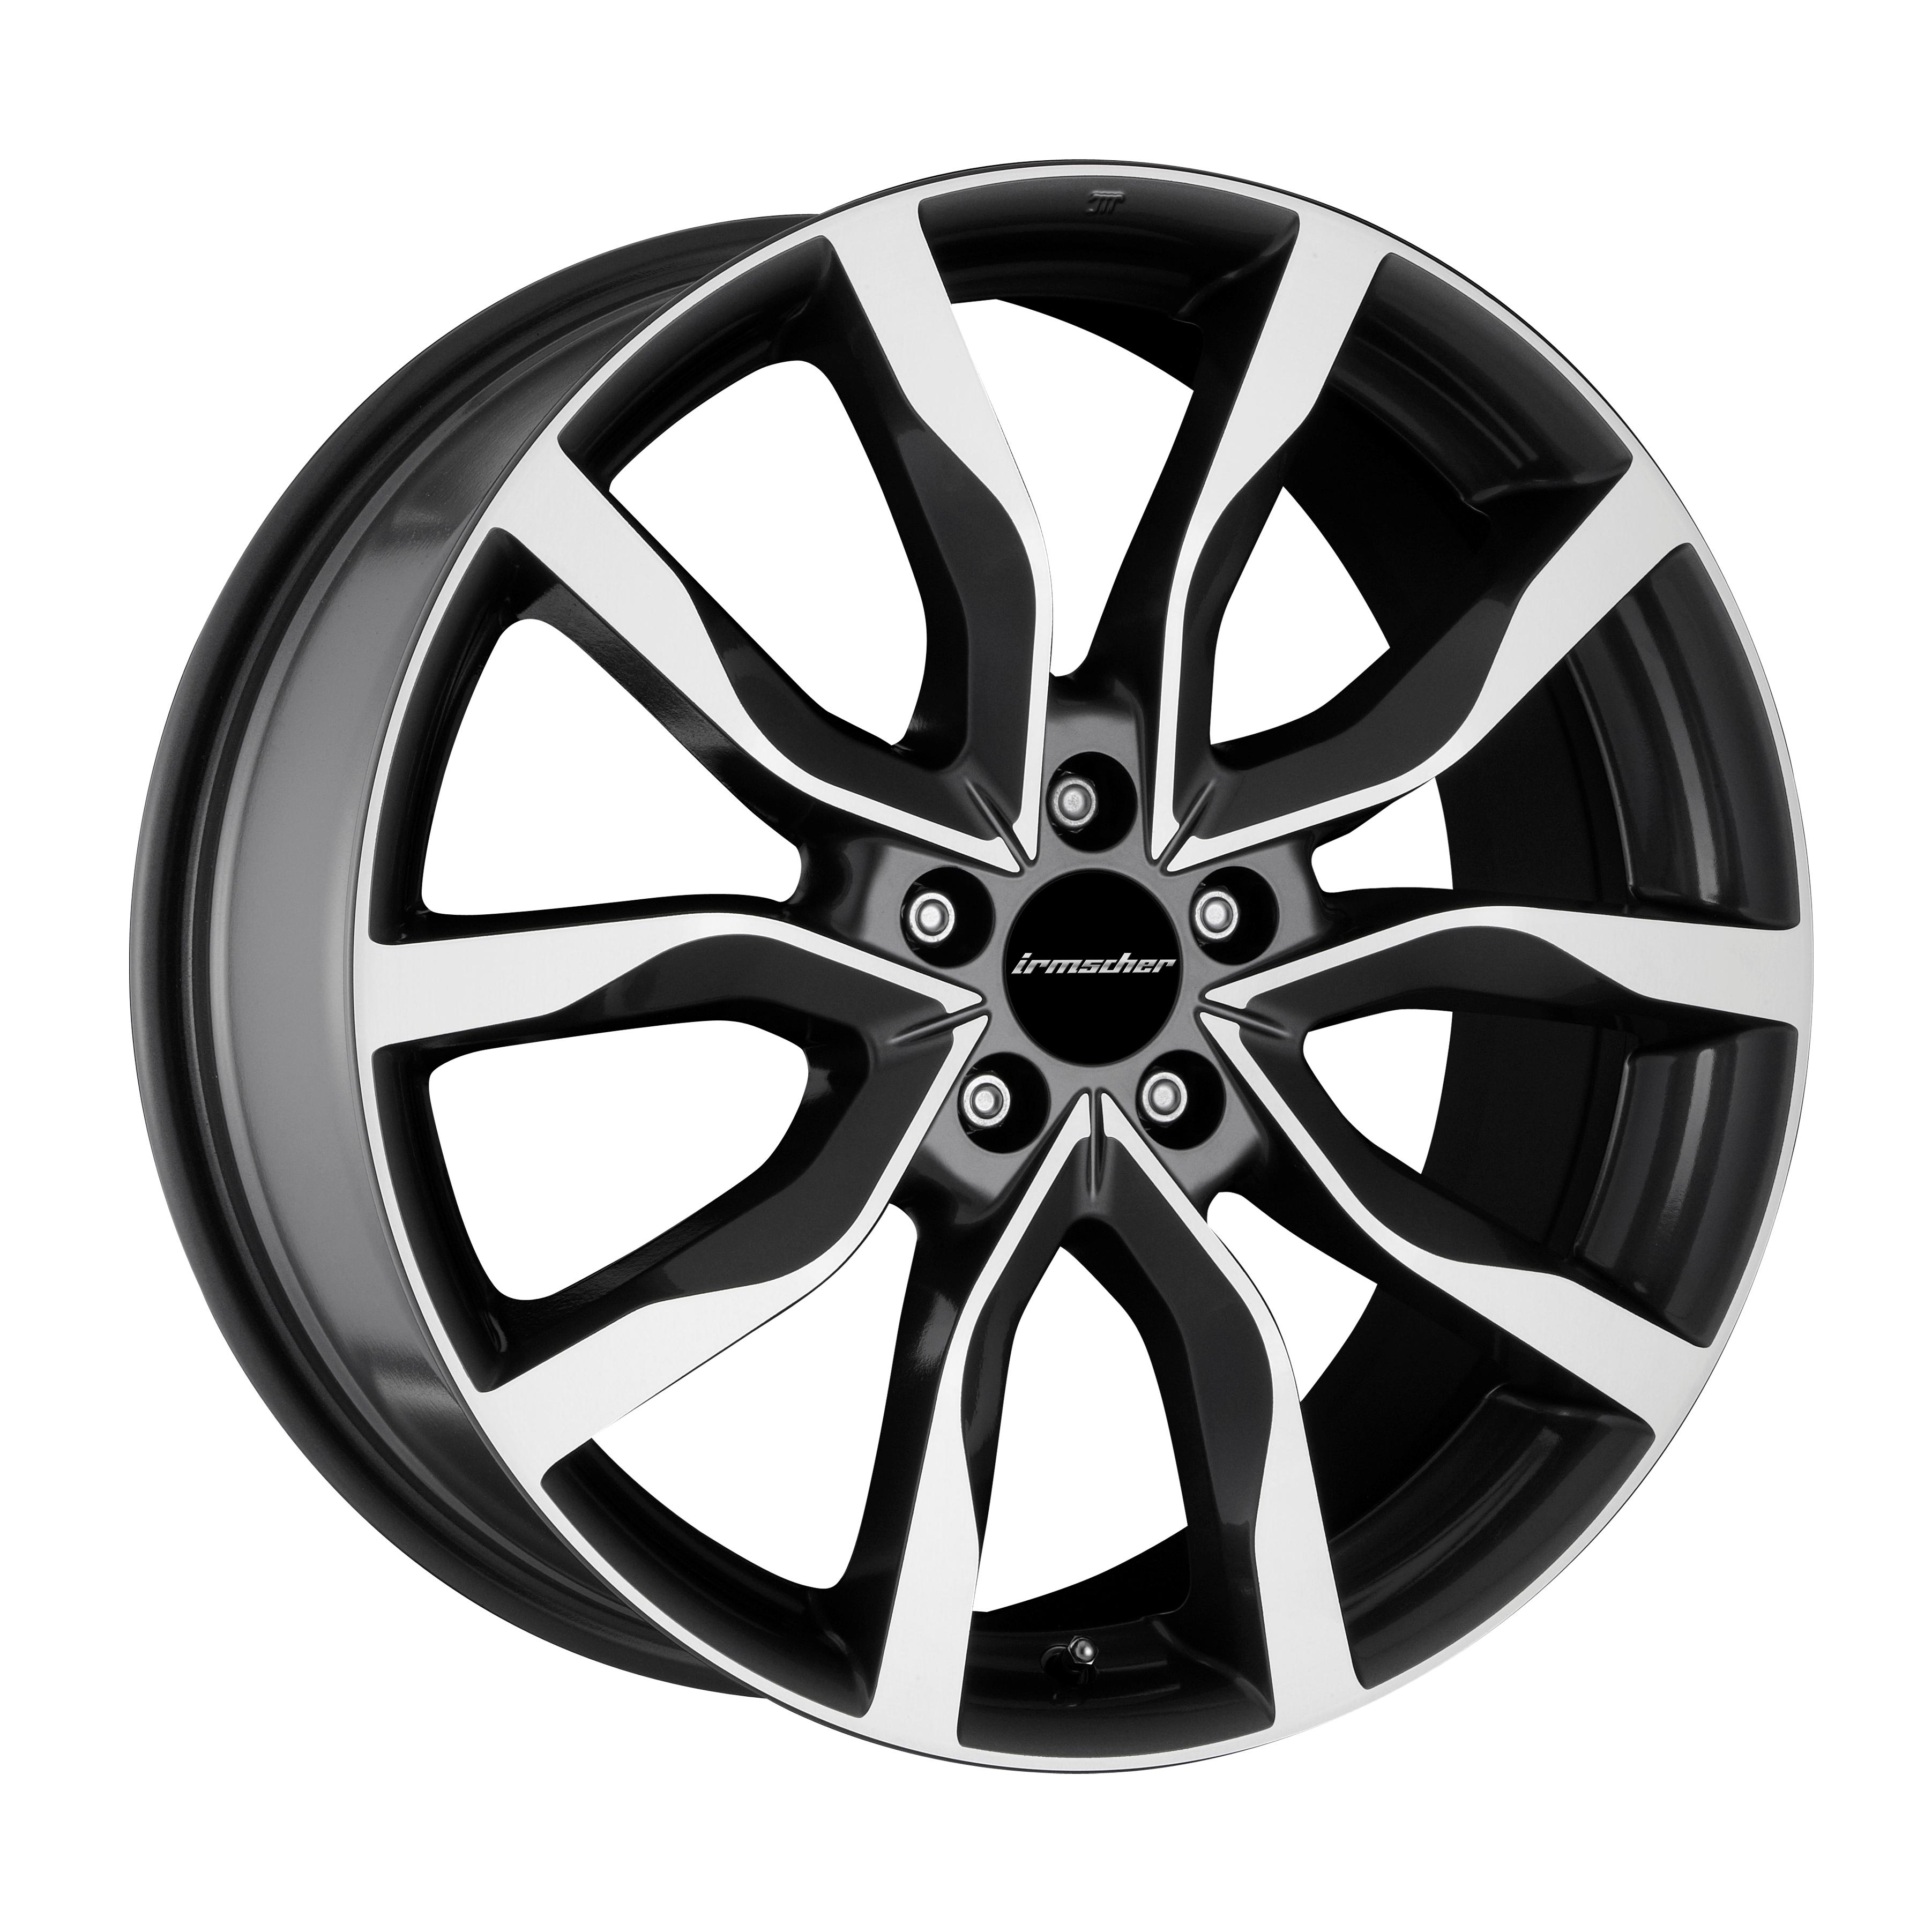 Lichtmetalen Velgen Opel Astra K Irmscher High Star Exclusive 19